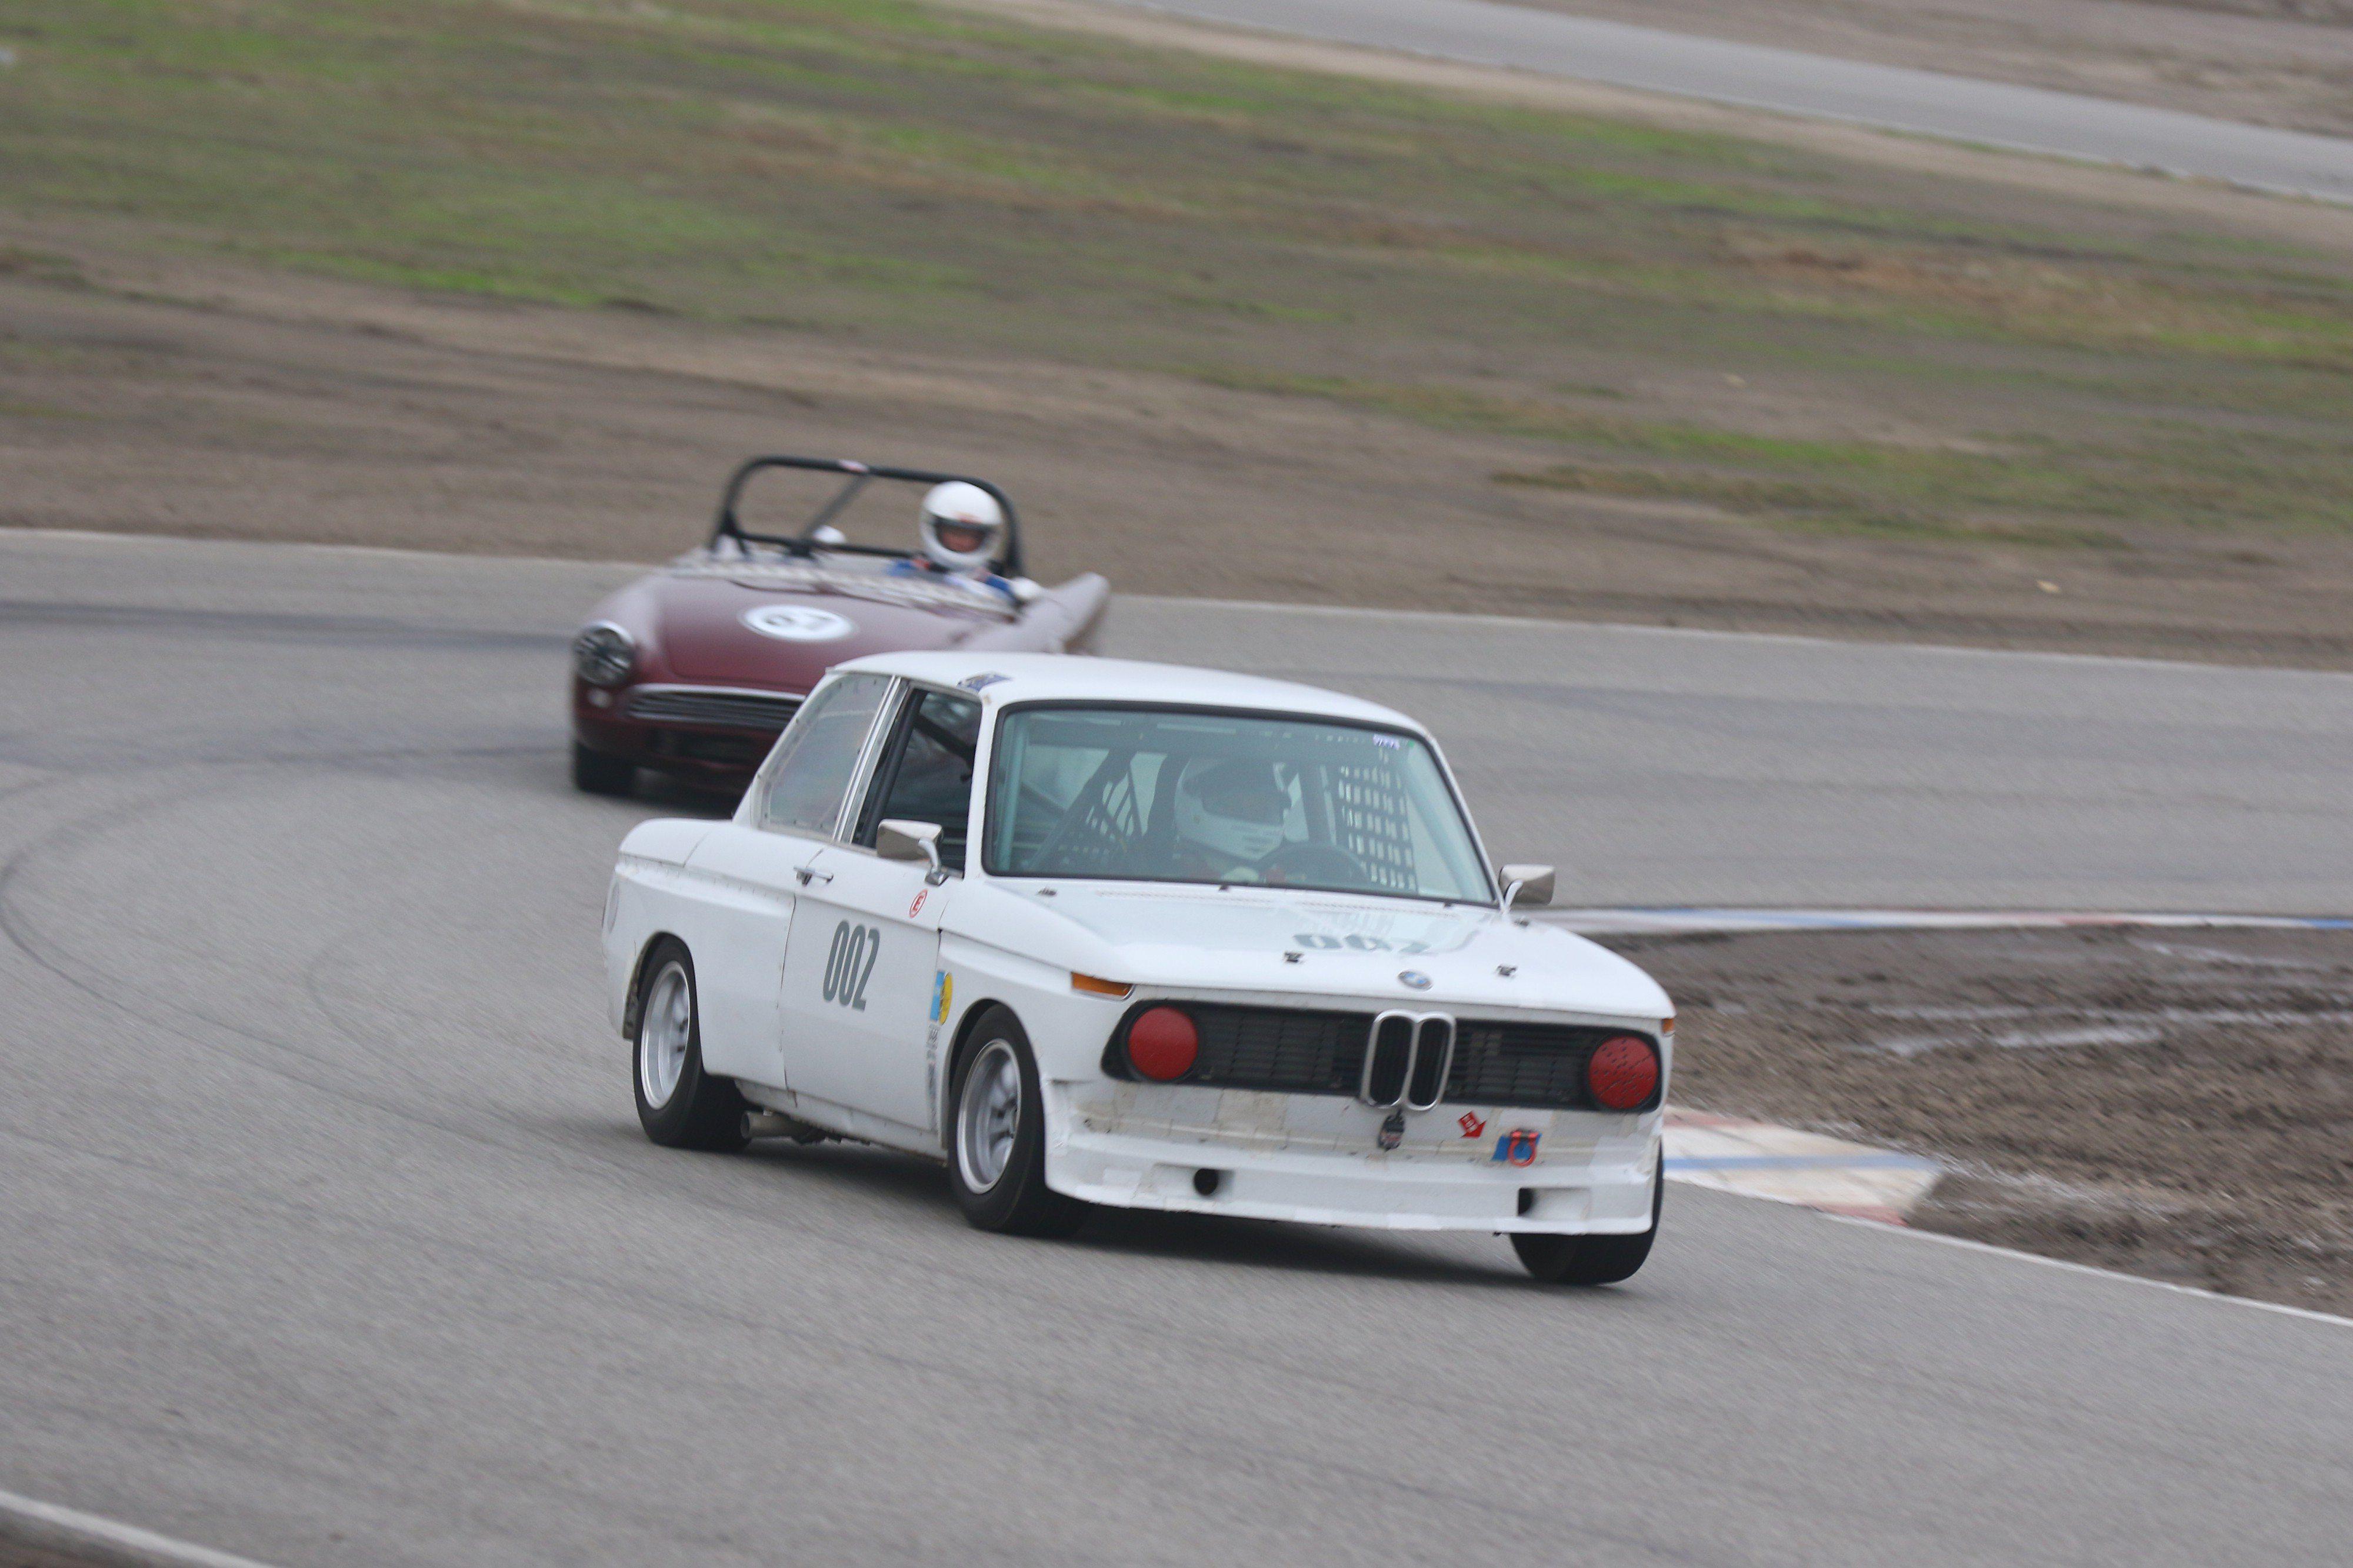 1974 BMW 2002 B Sedan RACE CAR - Cars for Sale - BMW 2002 FAQ